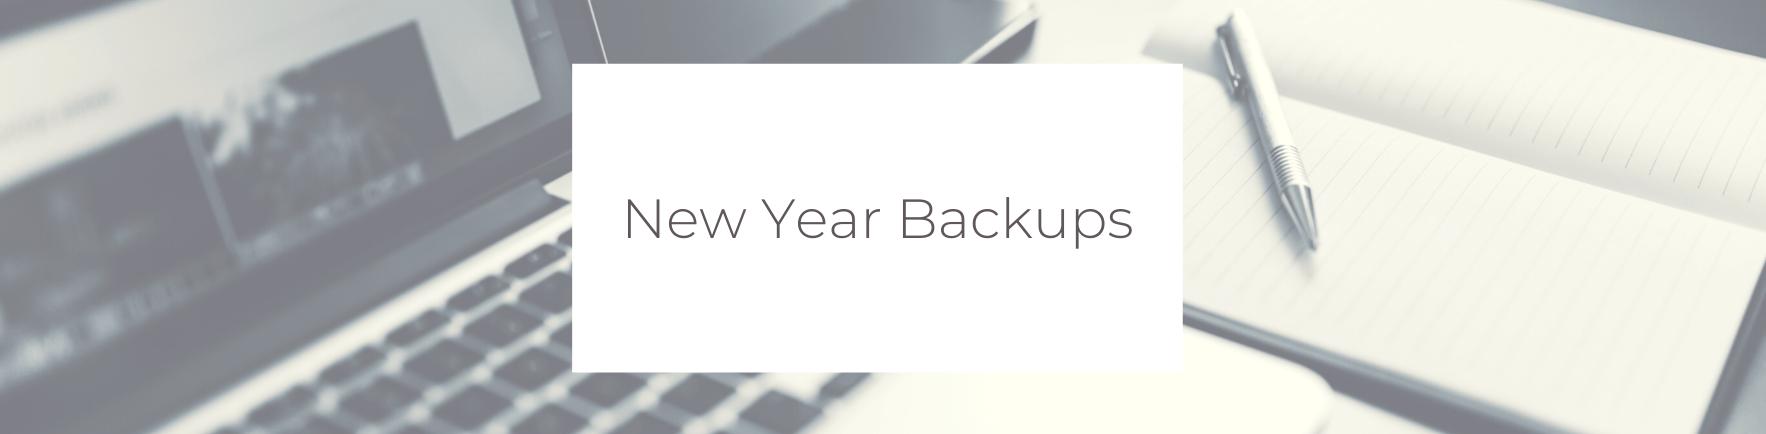 Blog: New Year Backups